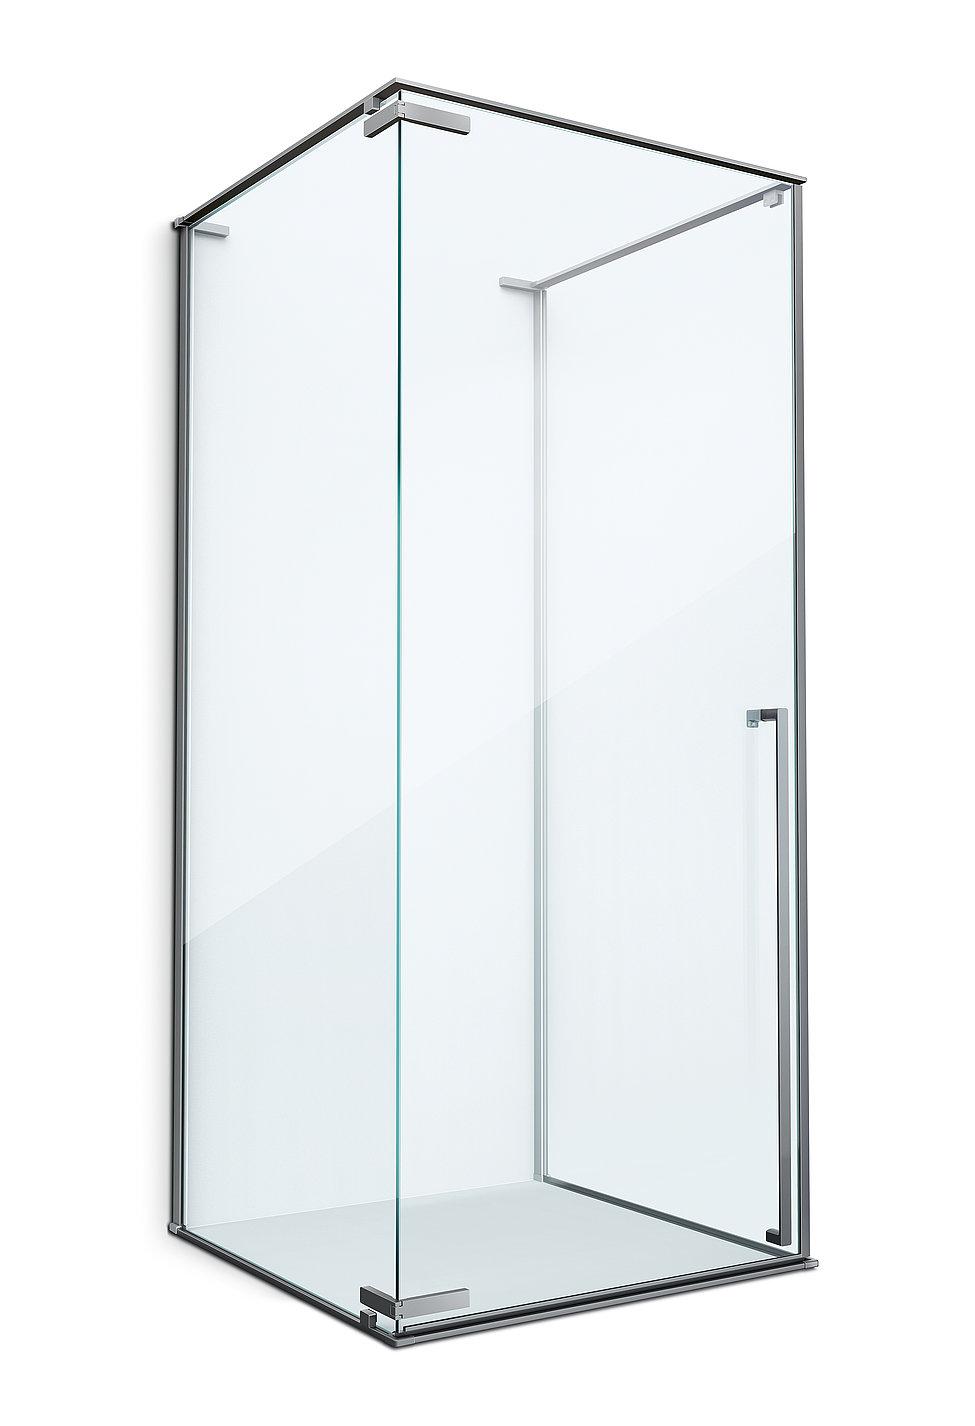 SX I AX Series I Shower Enclosure   Red Dot Design Award